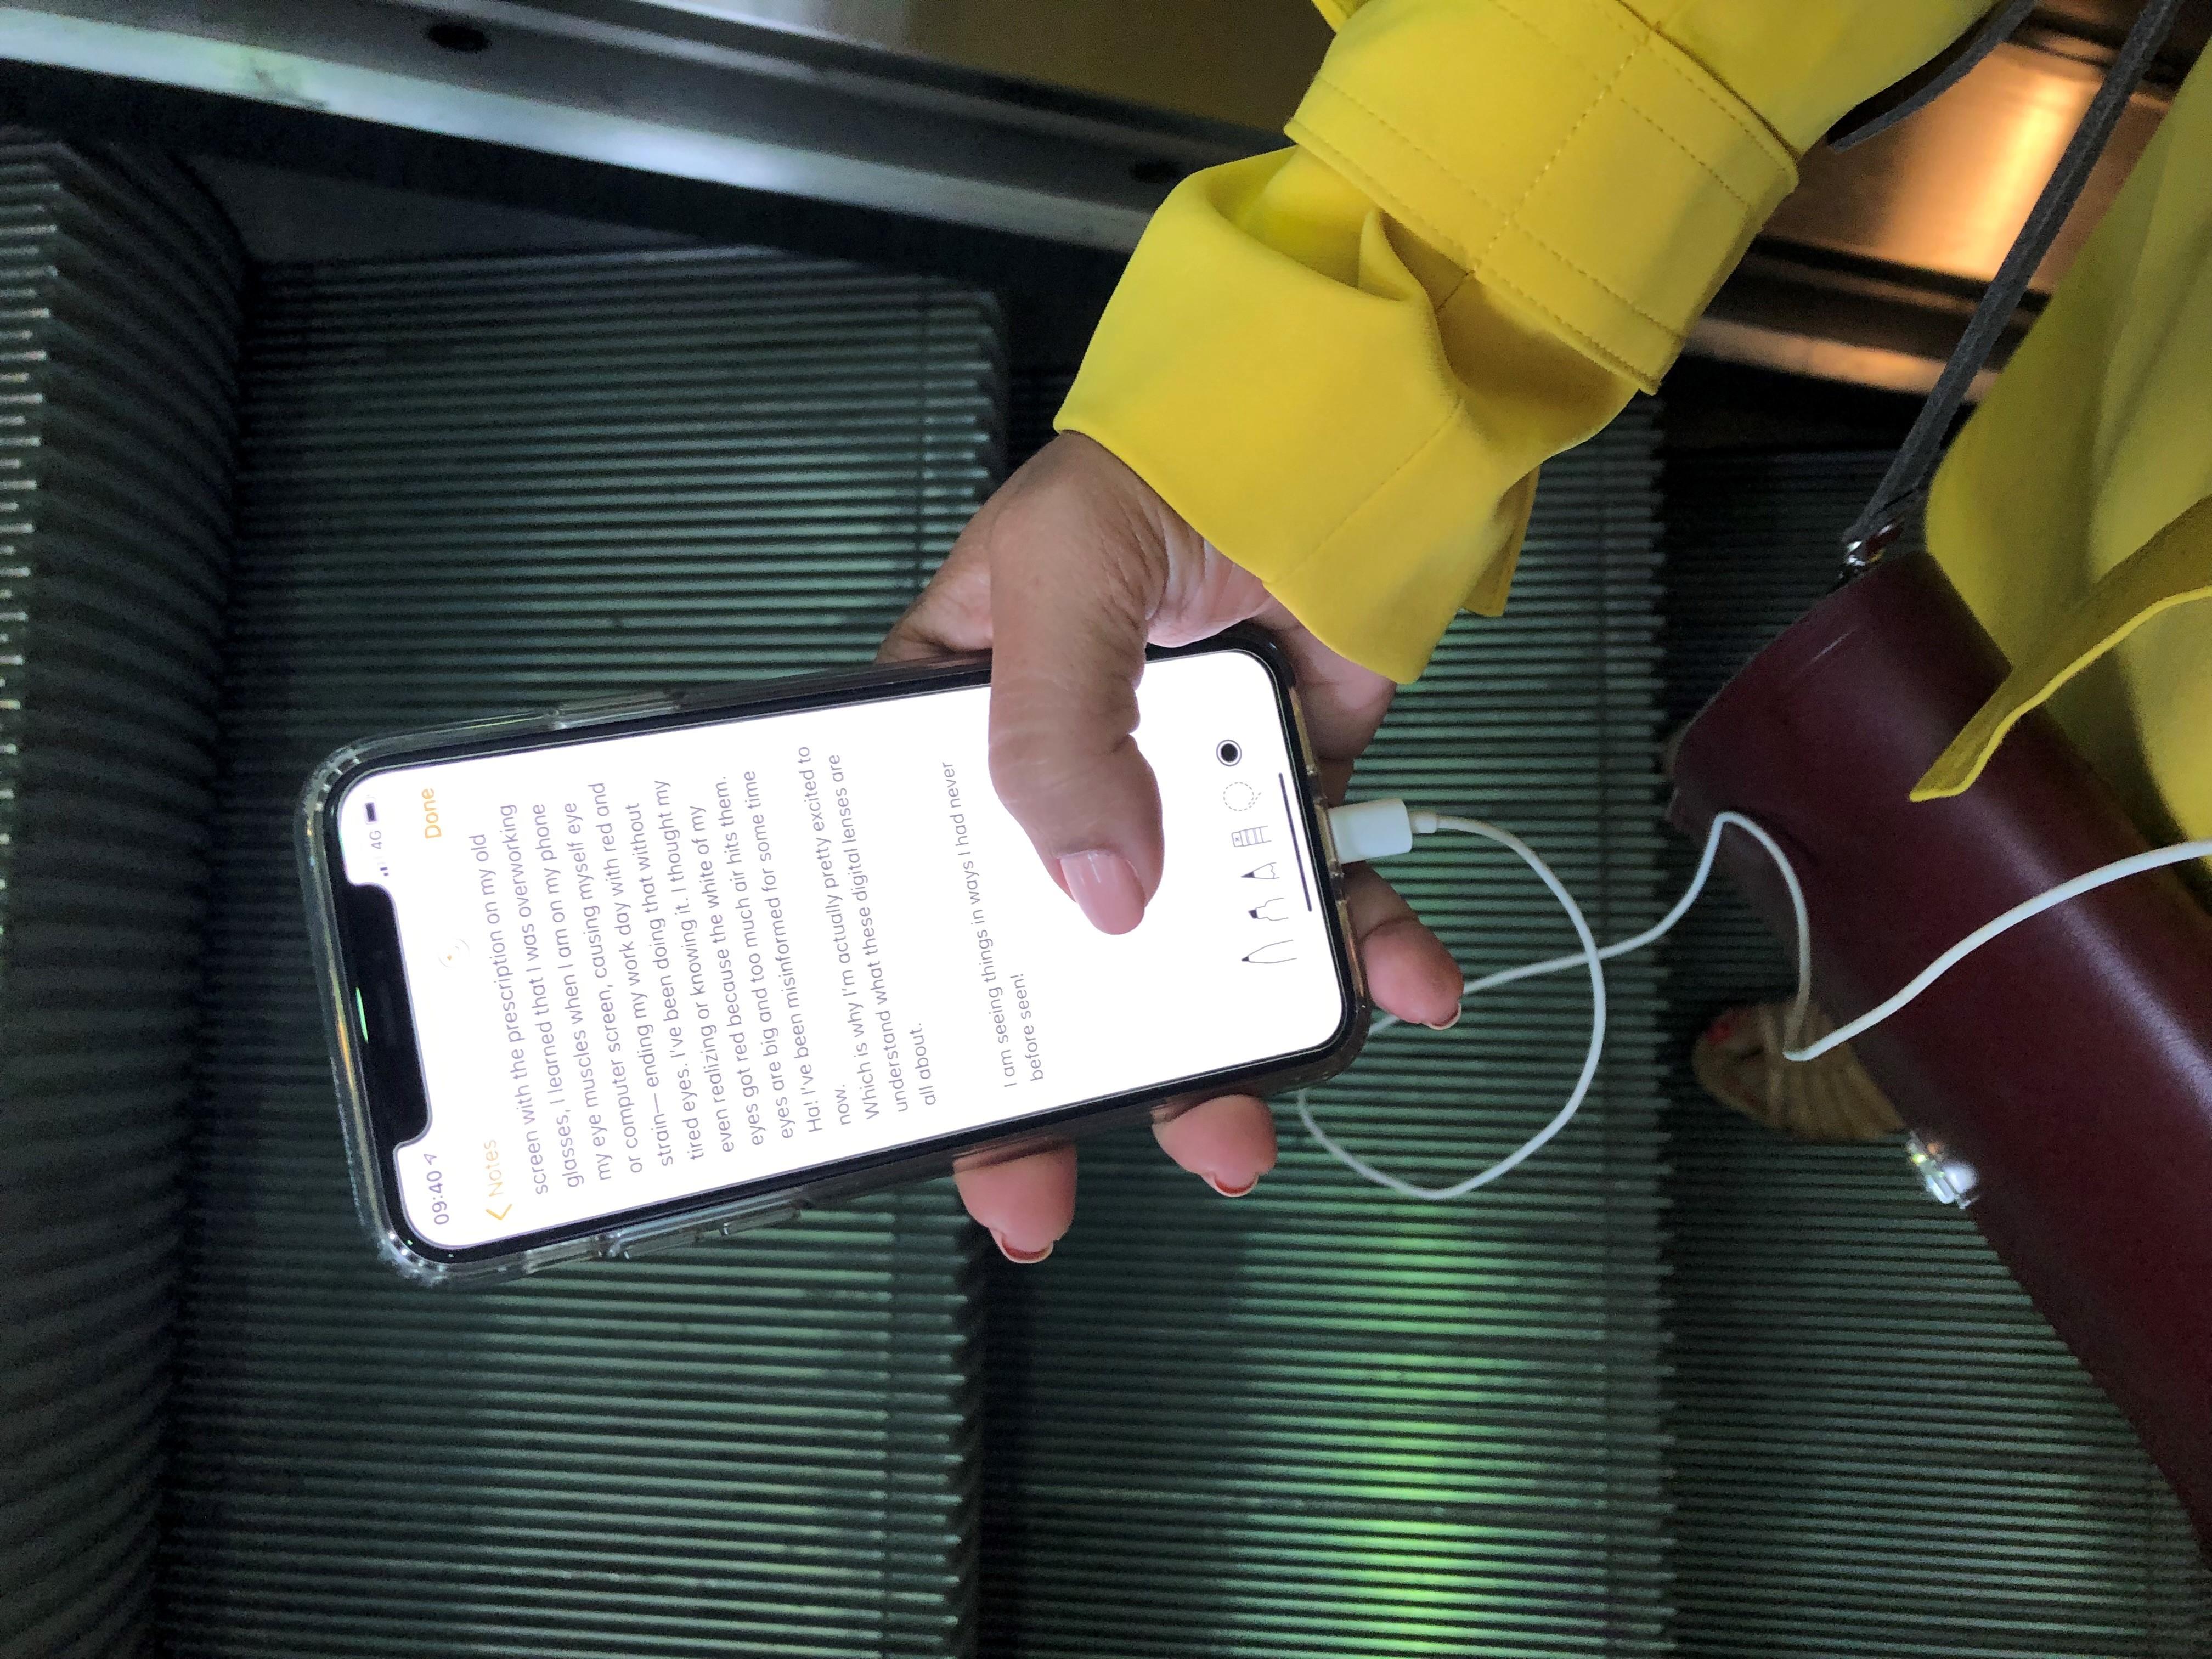 Digital Lenses Day One Phone on Escalator Image